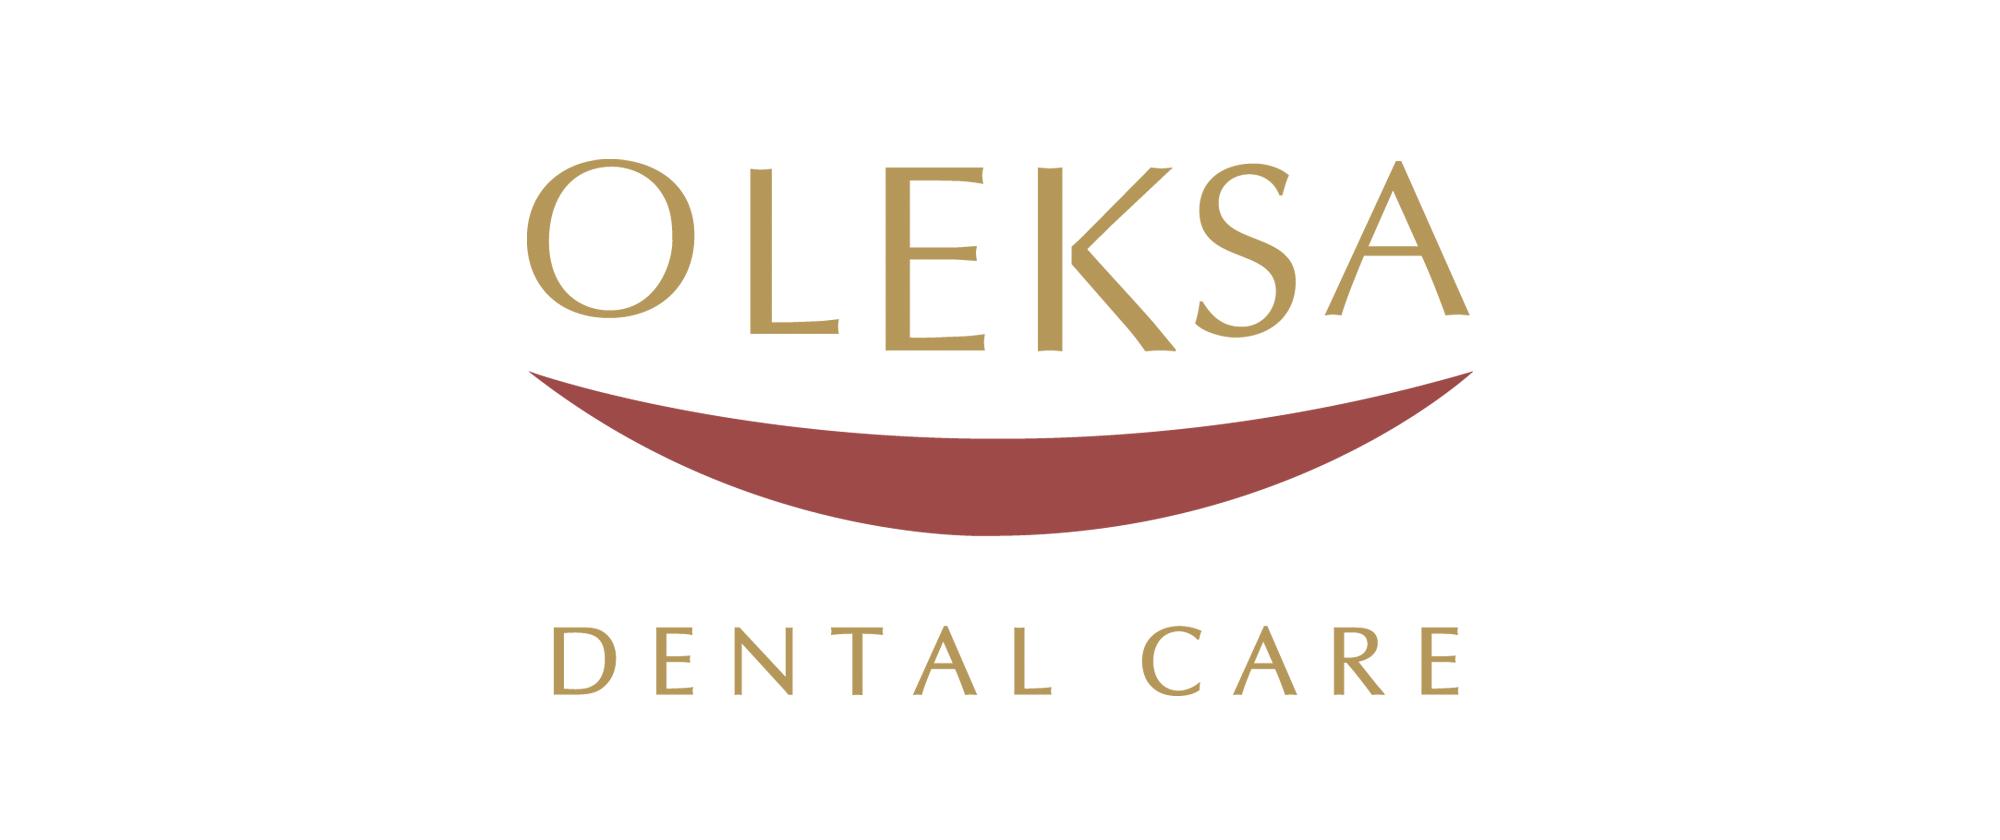 Oleksa Dental Logo